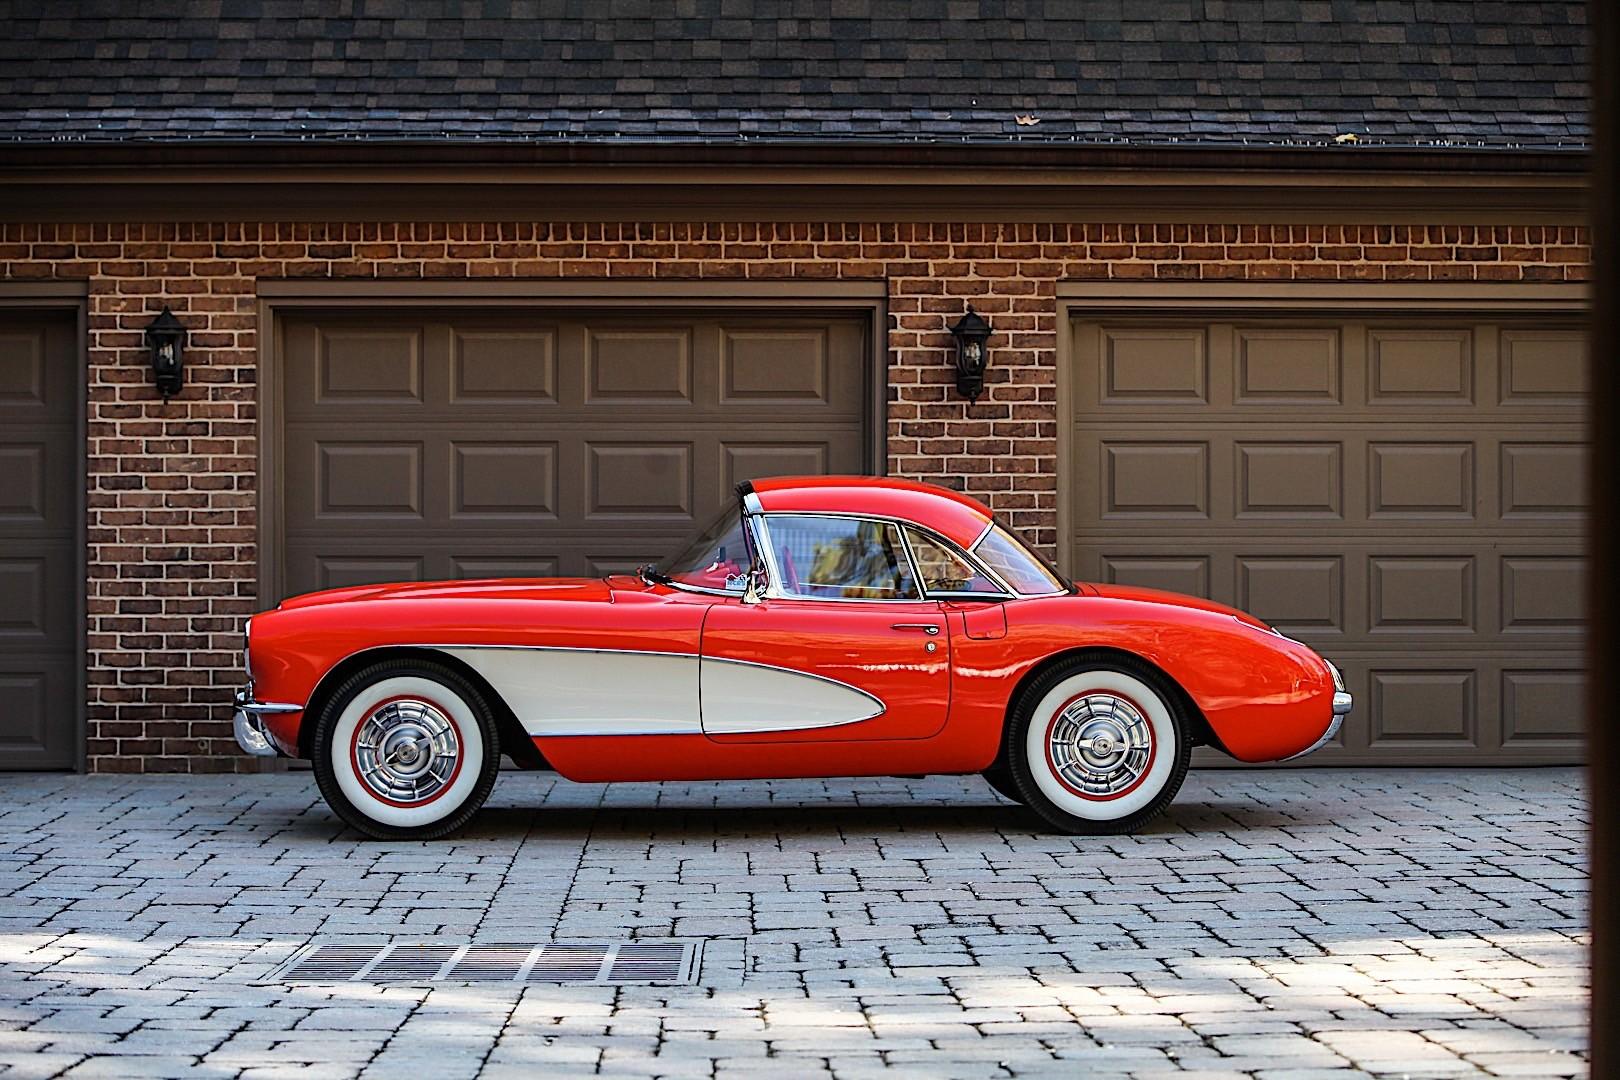 Pictures Of Corvettes >> CHEVROLET Corvette C1 specs - 1956, 1957, 1958, 1959, 1960 ...